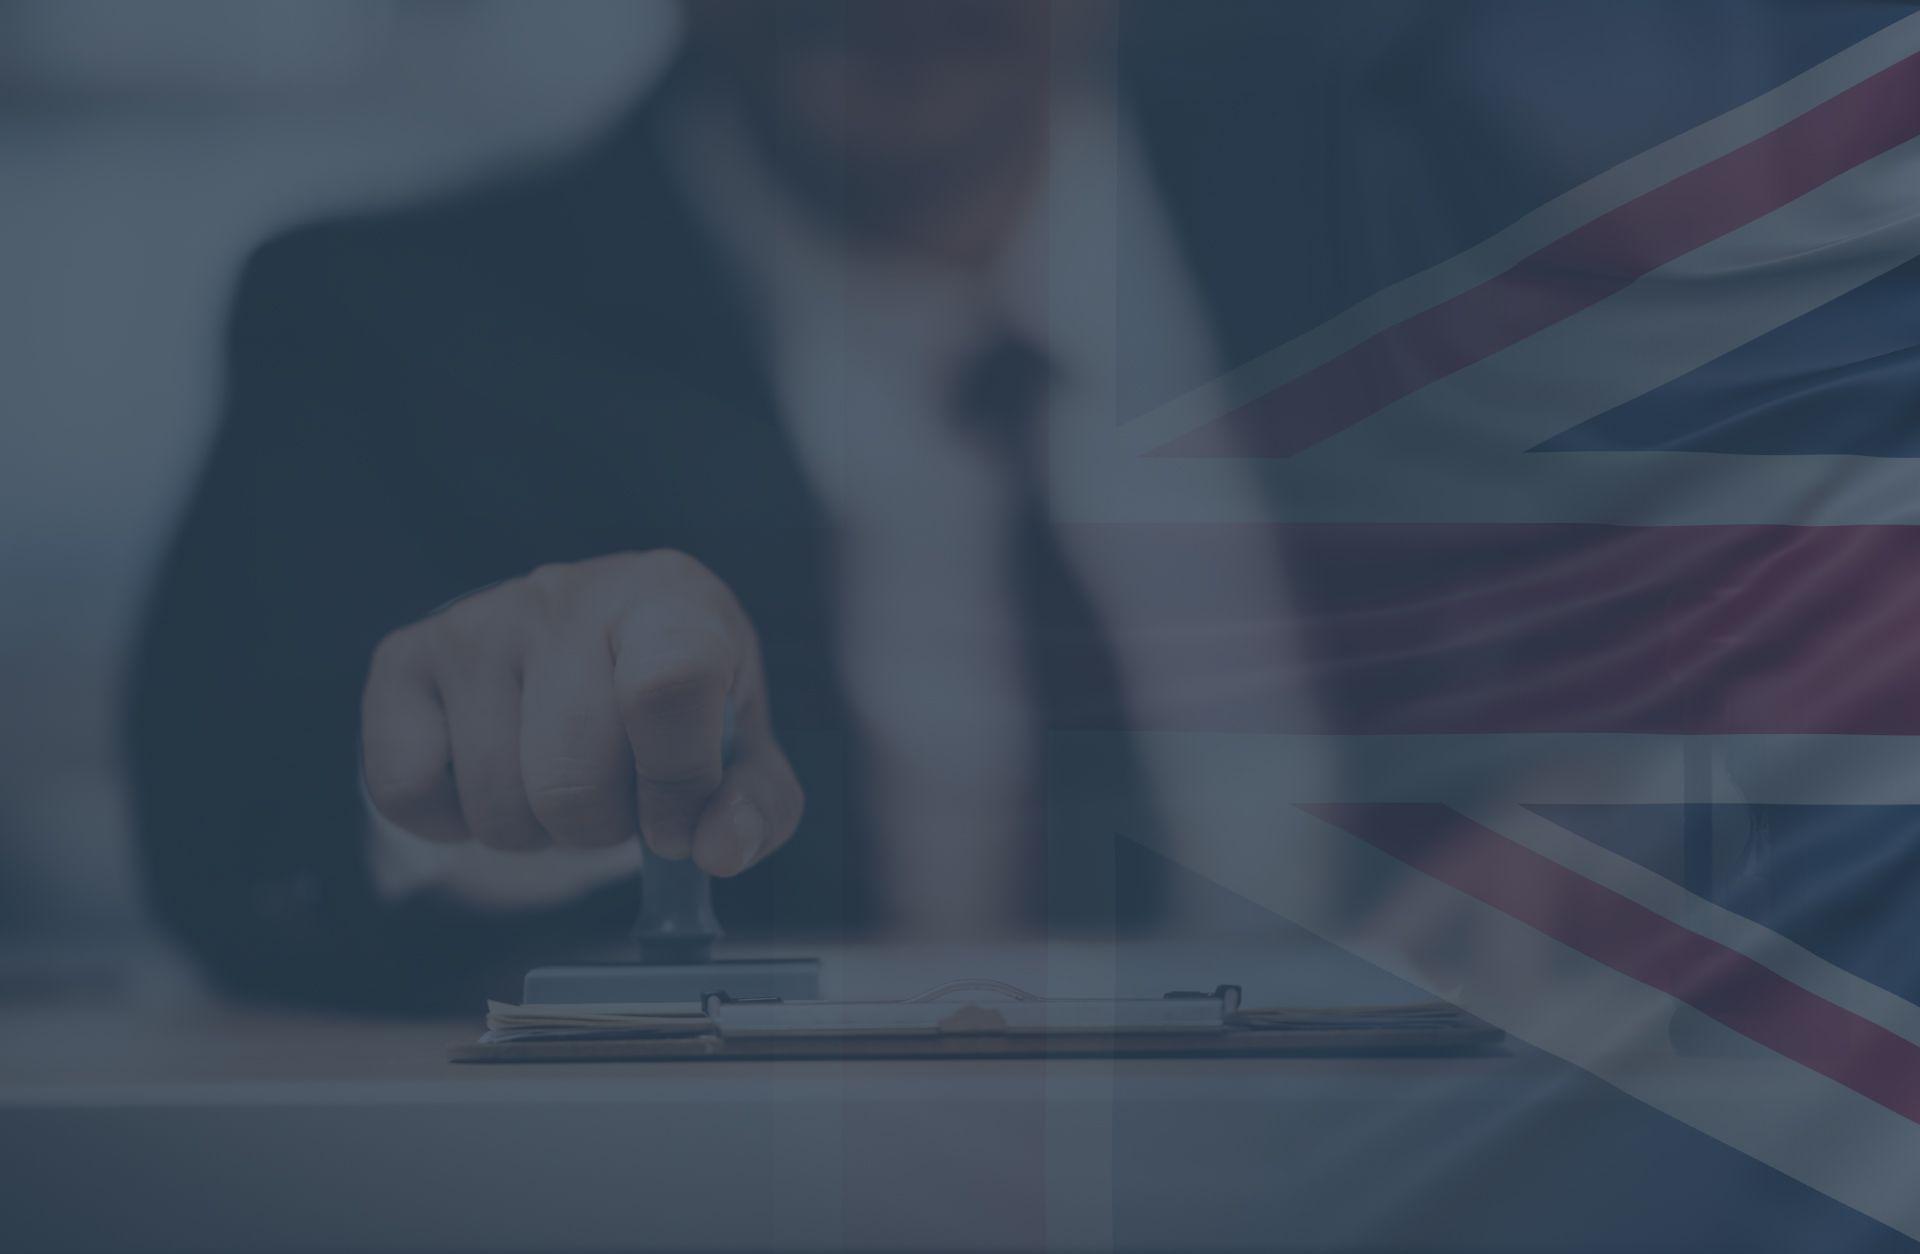 Uk Golabl Talent Visa Documents Required_Desktop